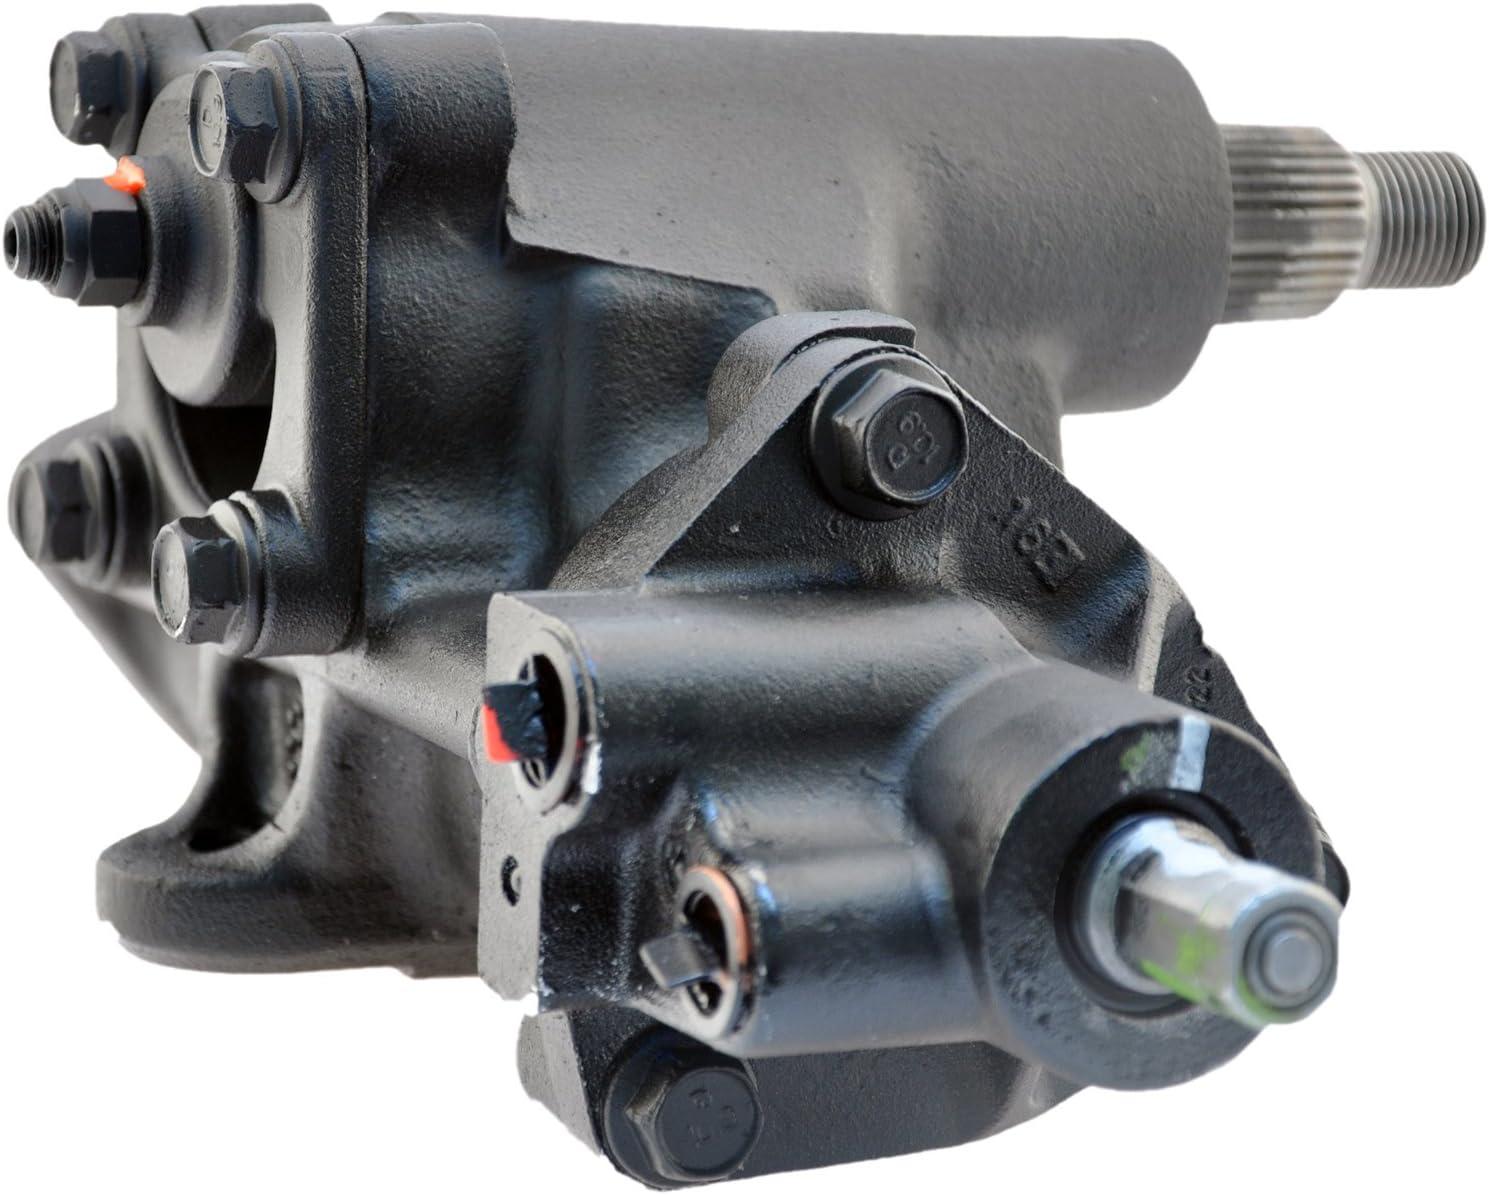 Parts Master 92120 Power Steering Return Hose